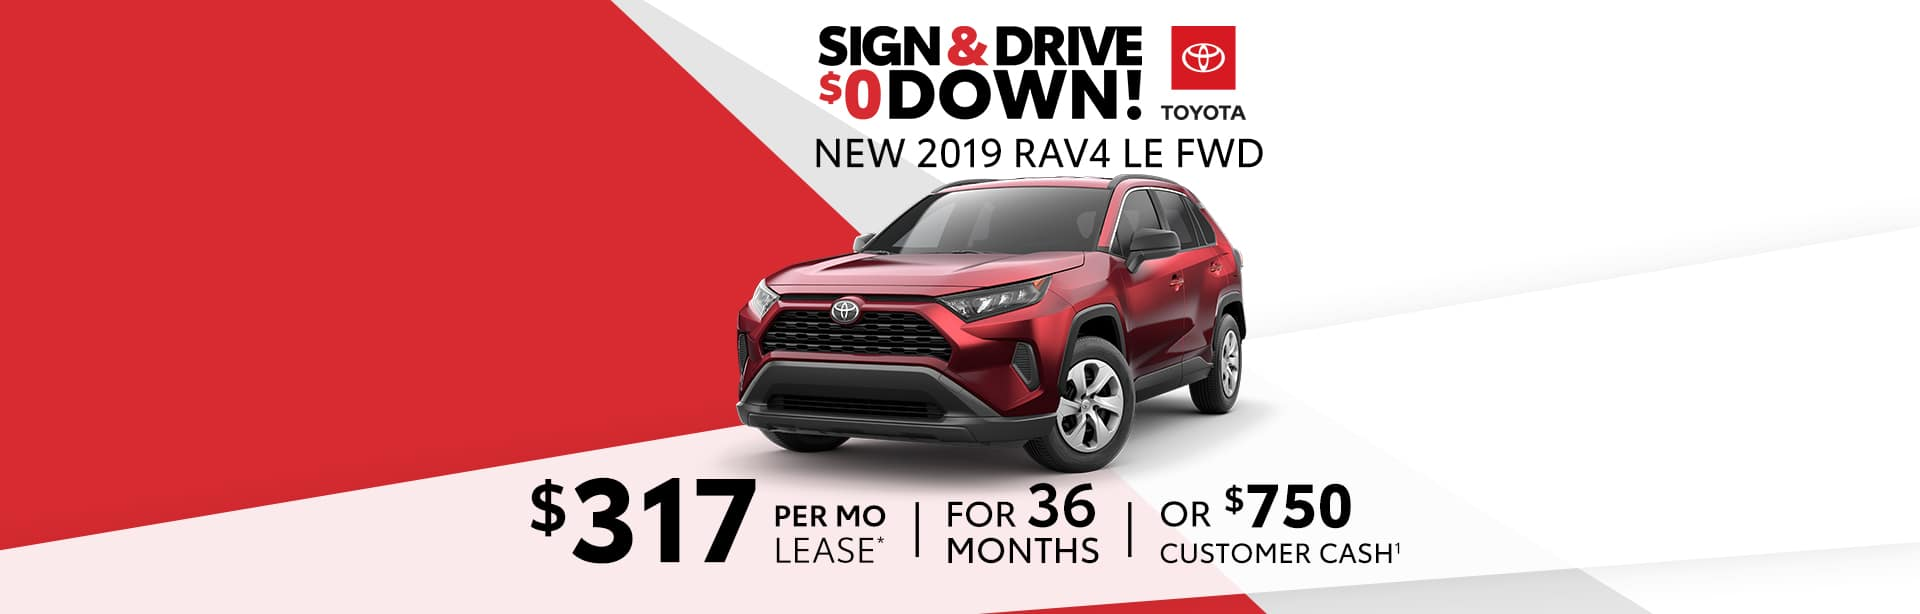 Best Deal on a New RAV4 near Franklin, Indiana.